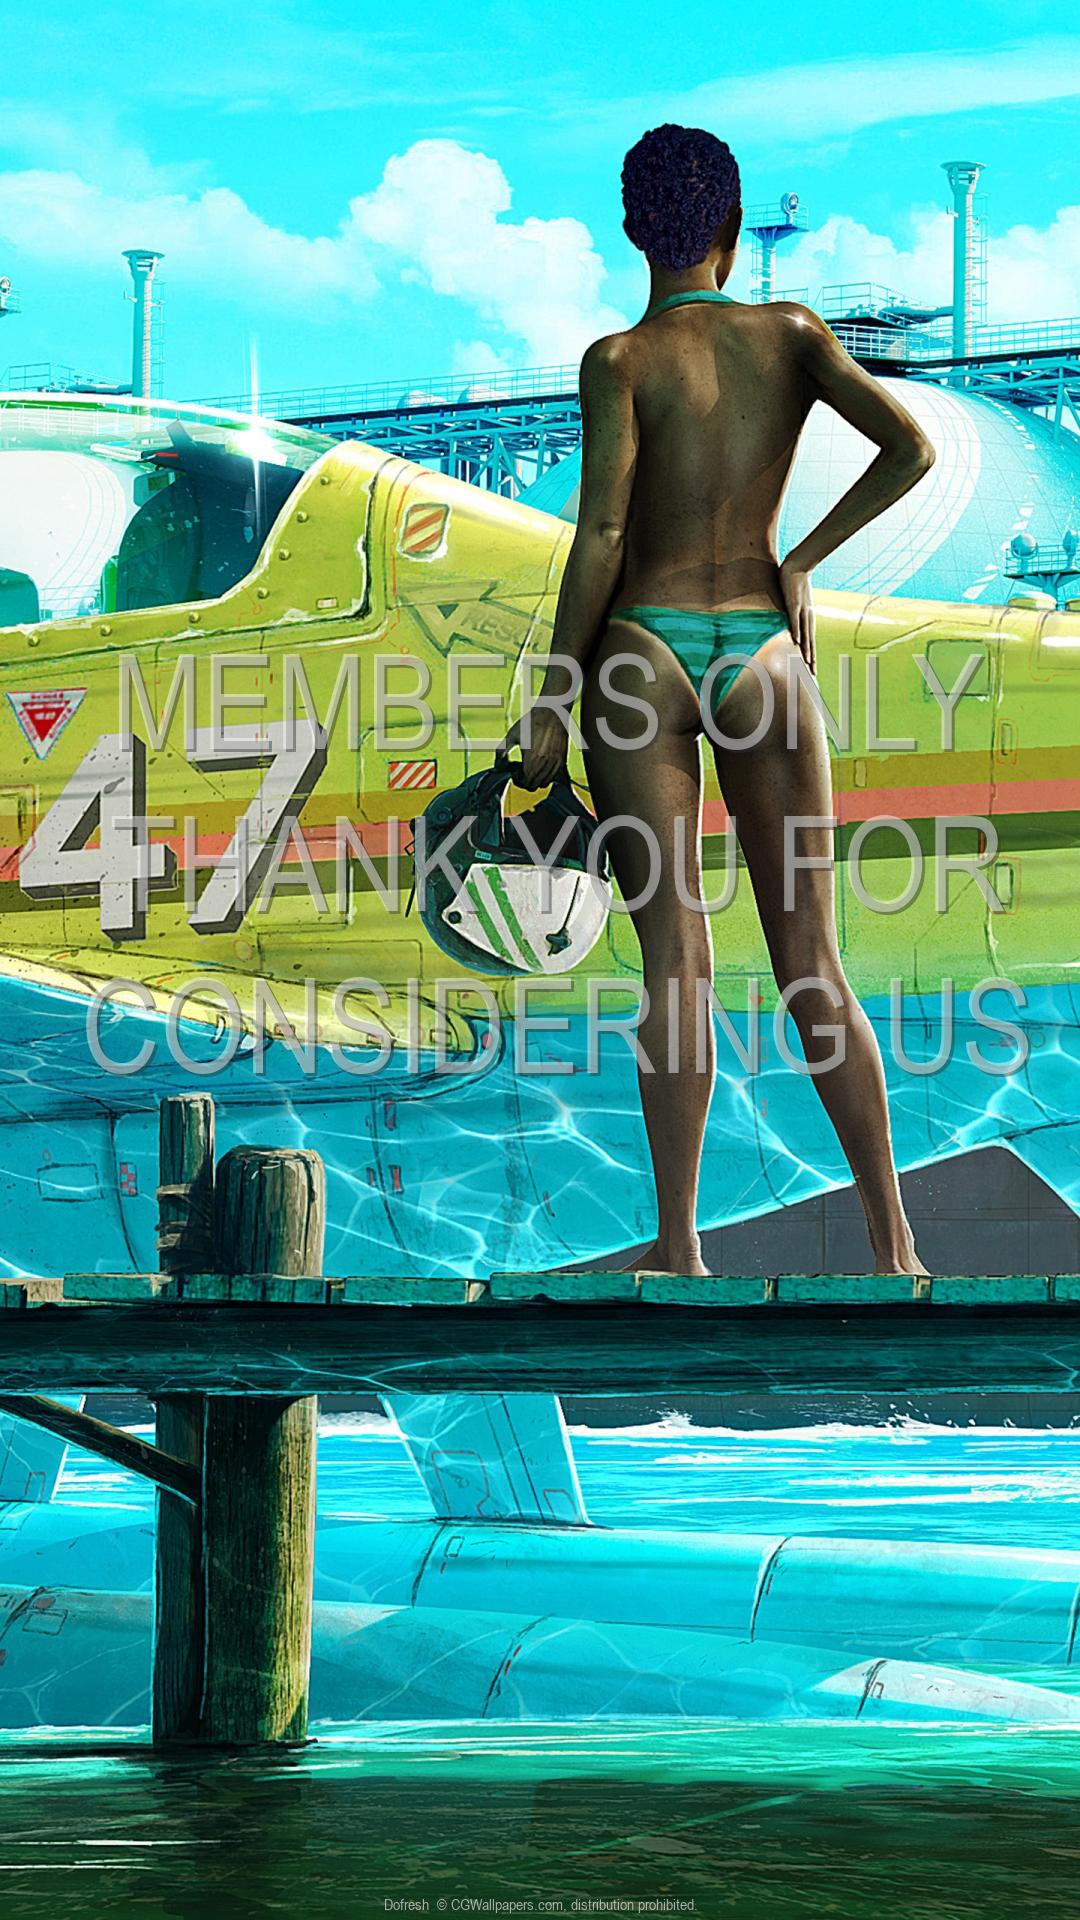 Dofresh  1920x1080 Mobile wallpaper or background 20